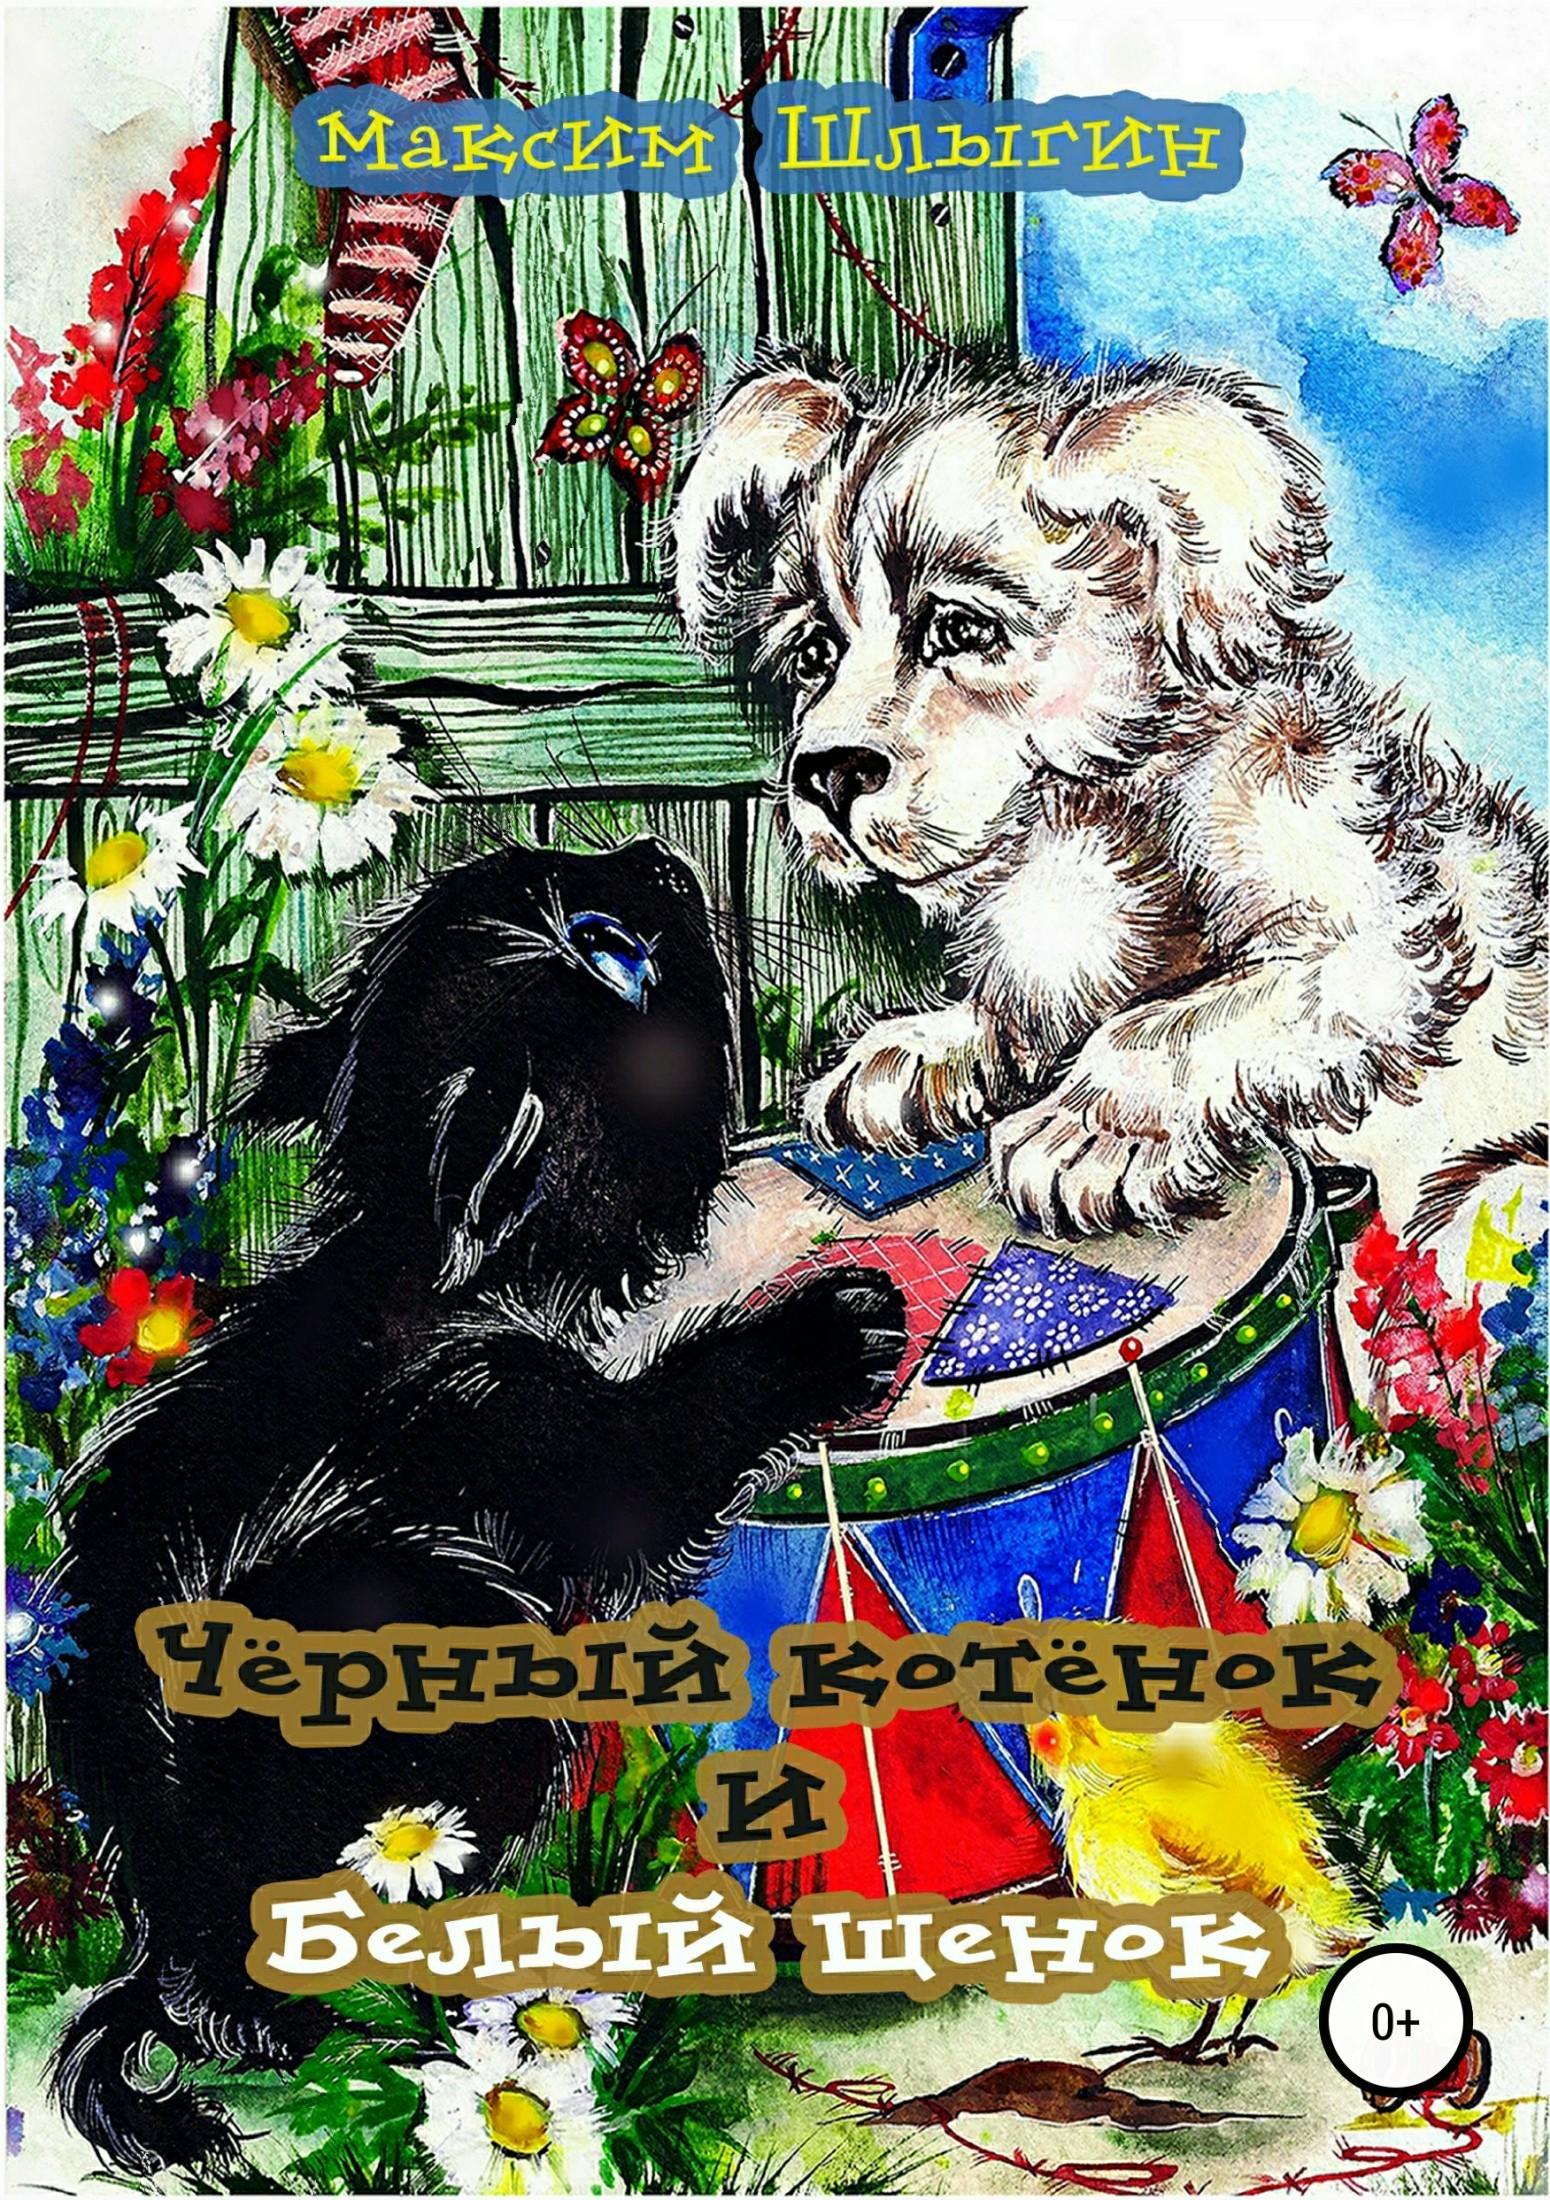 Максим Шлыгин, Артемий Волынский - Чёрный котёнок и белый щенок